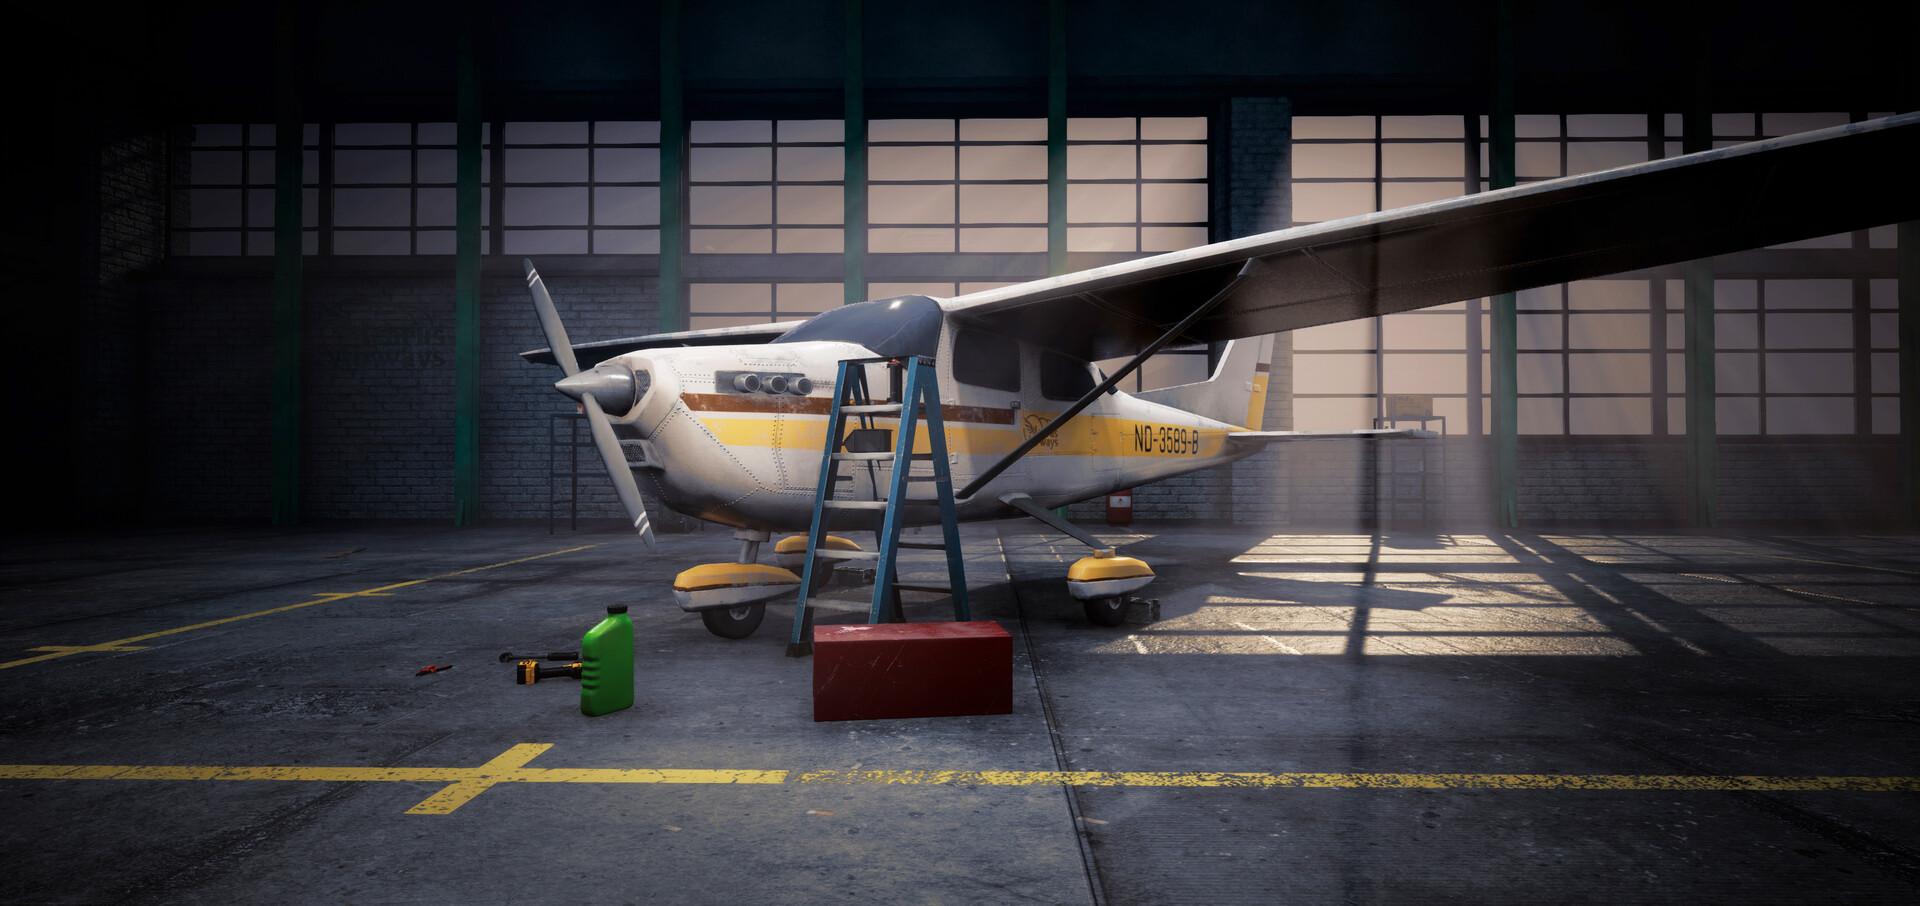 ArtStation - Airplane Hangar - Unreal Engine, Edgars Soiko